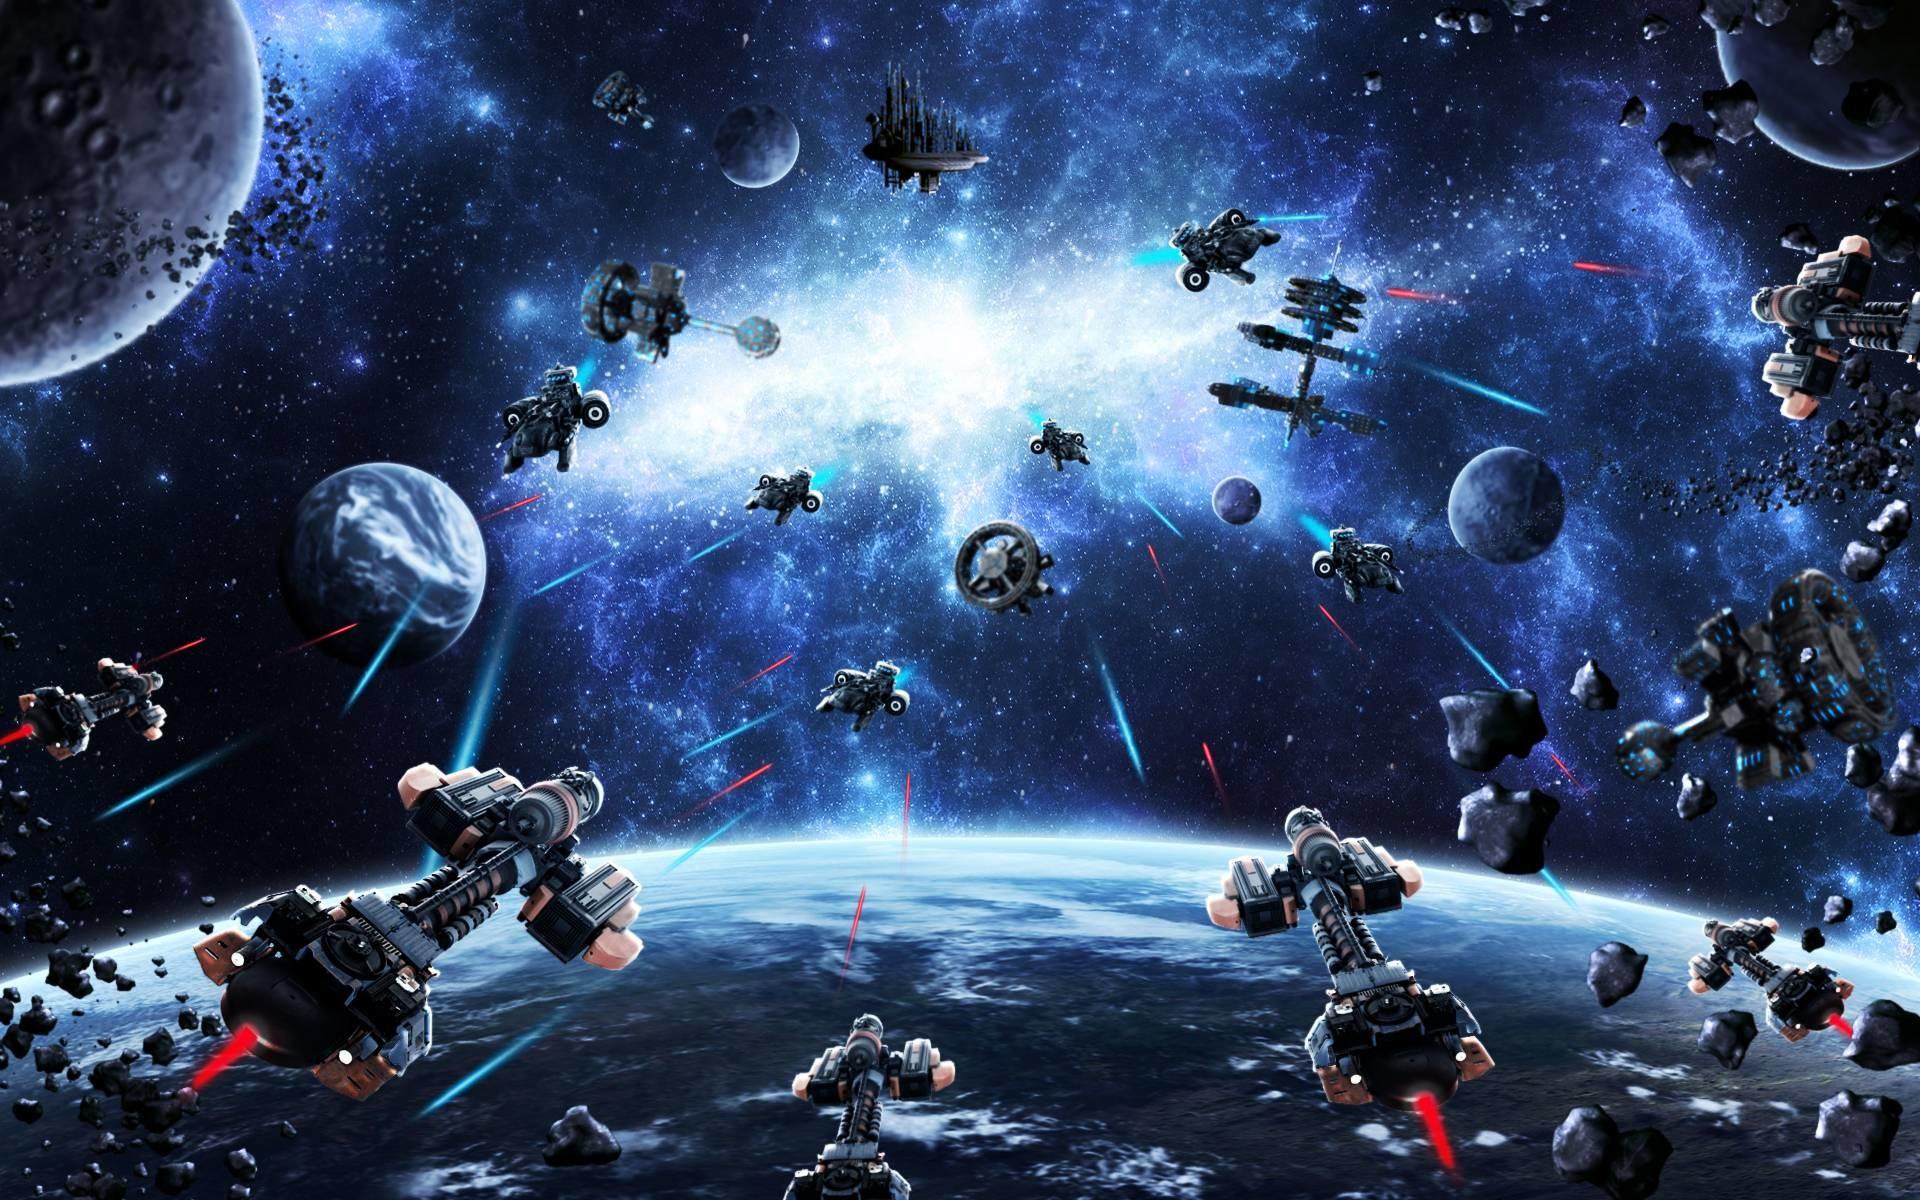 Epic Space War Wallpaper Desktop Background #oiz